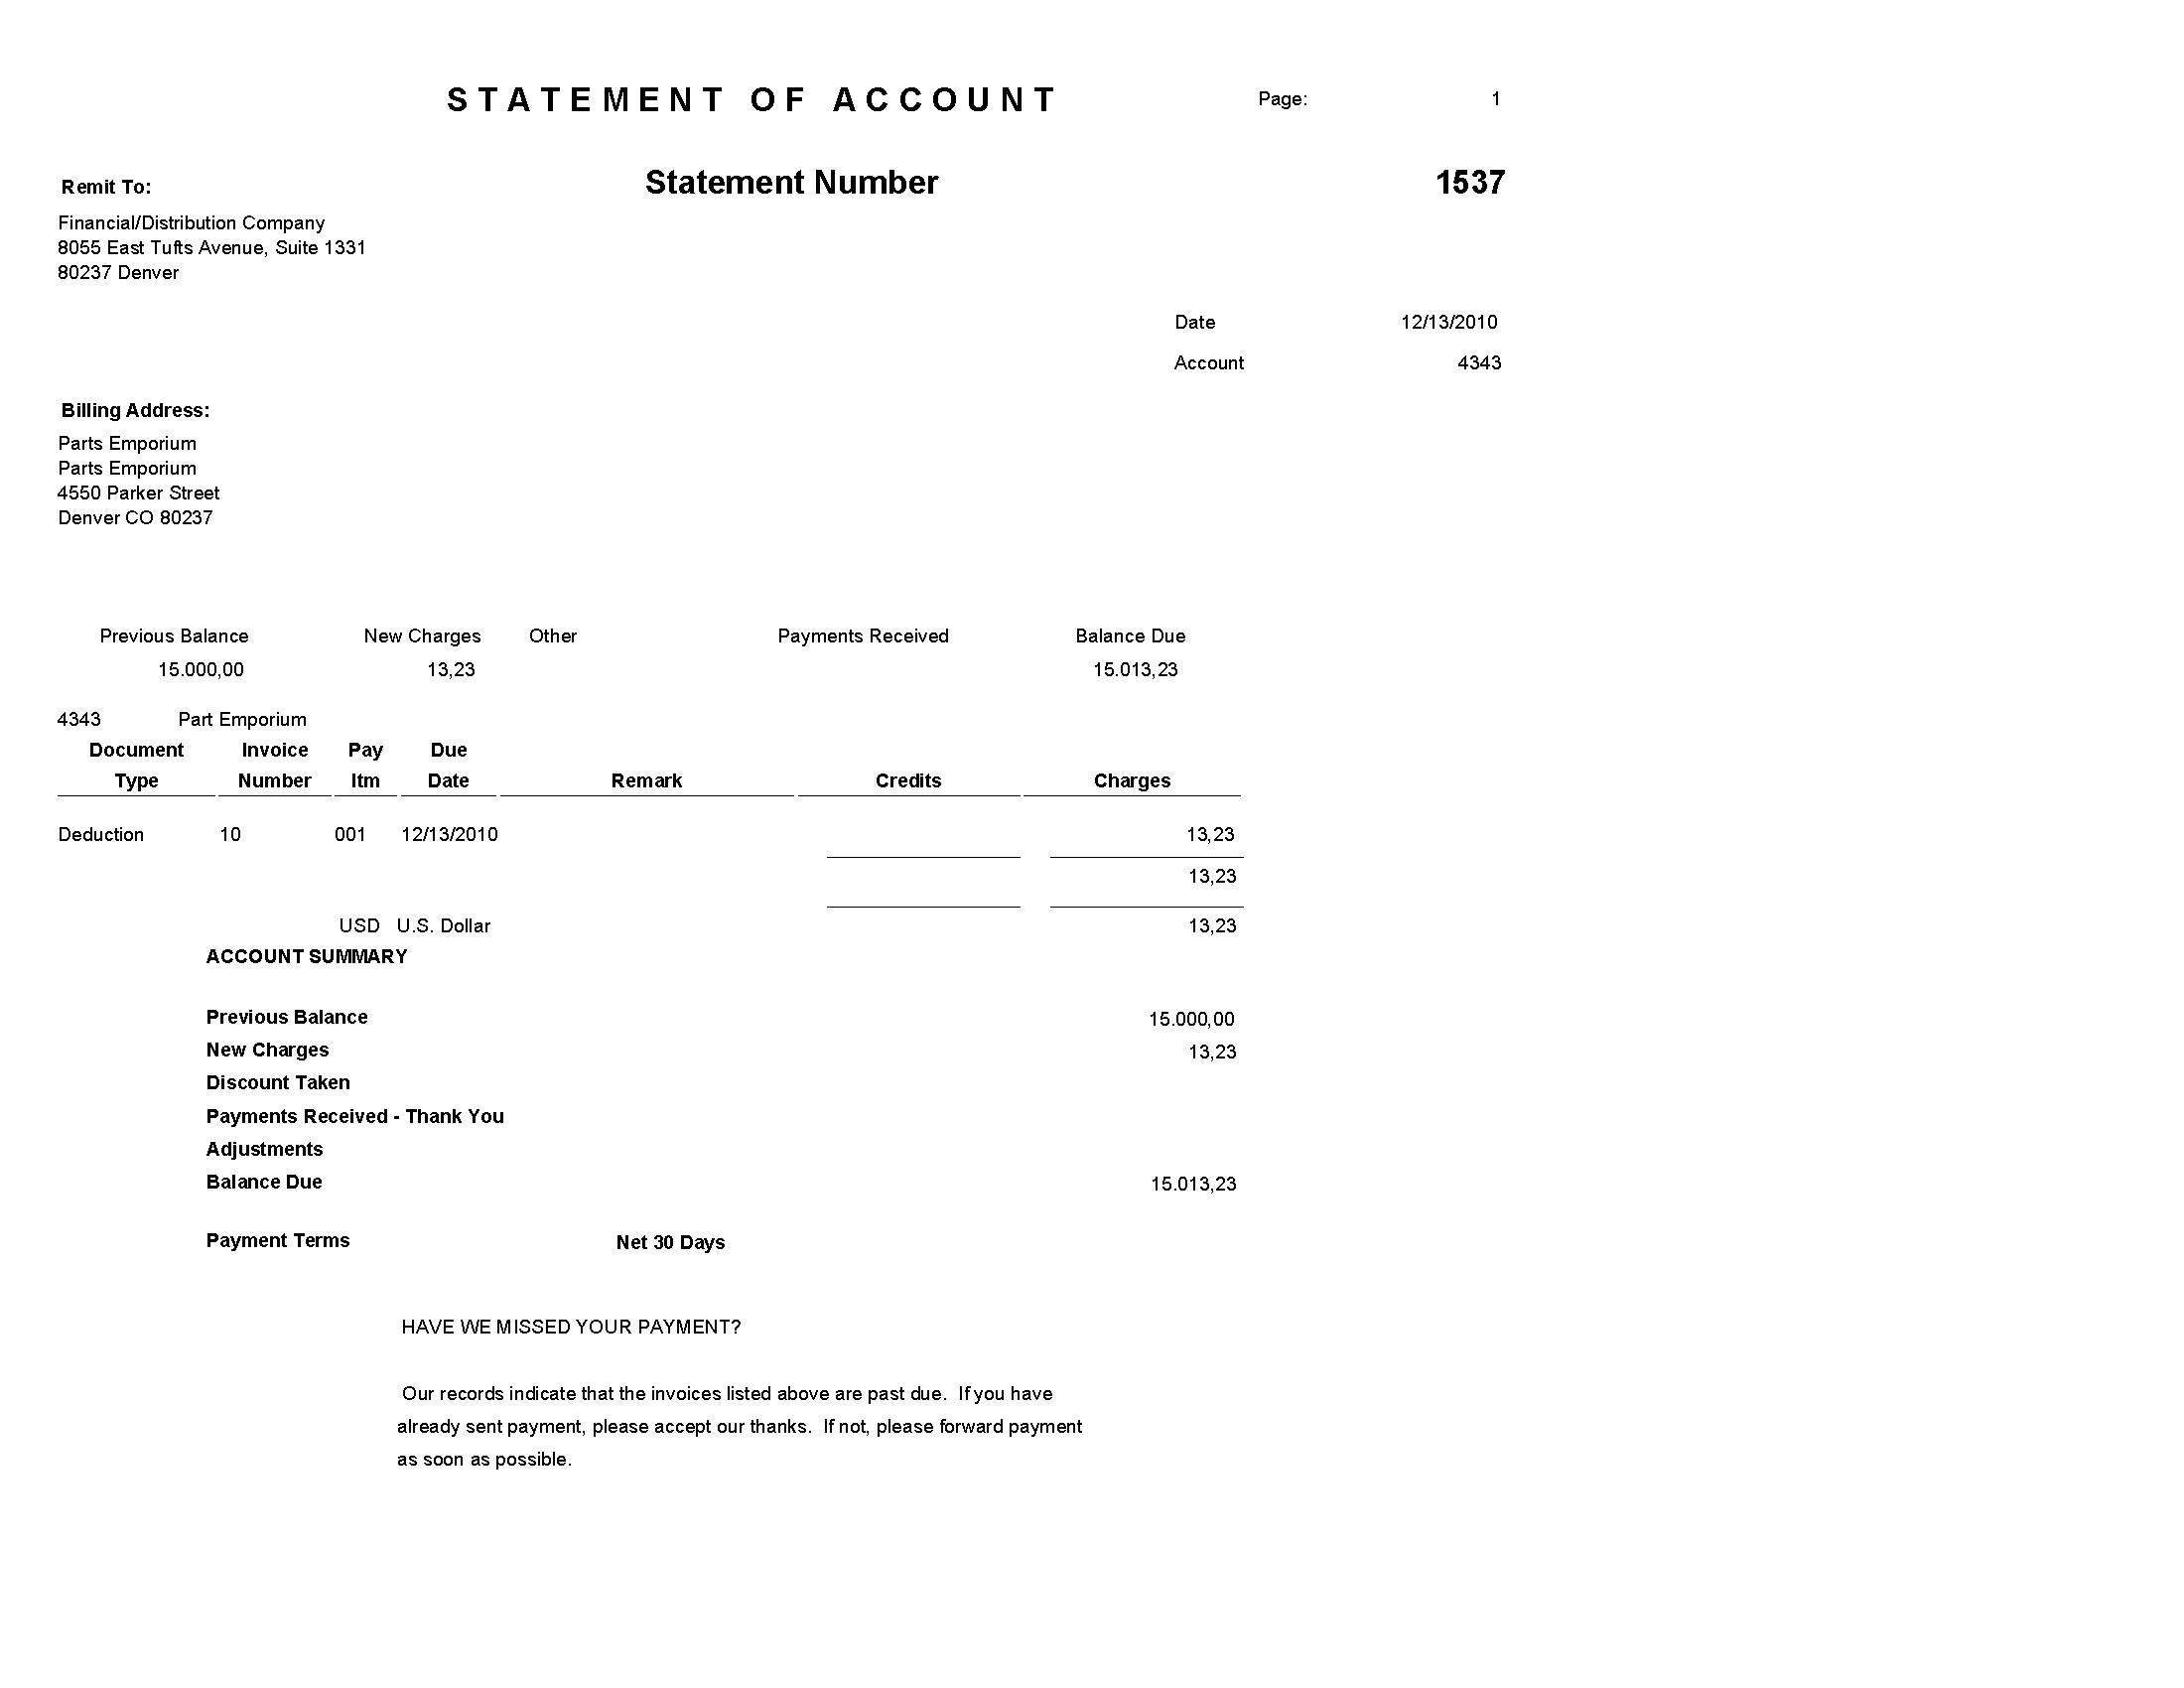 jd edwards enterpriseone accounts receivable reports credit note statement form